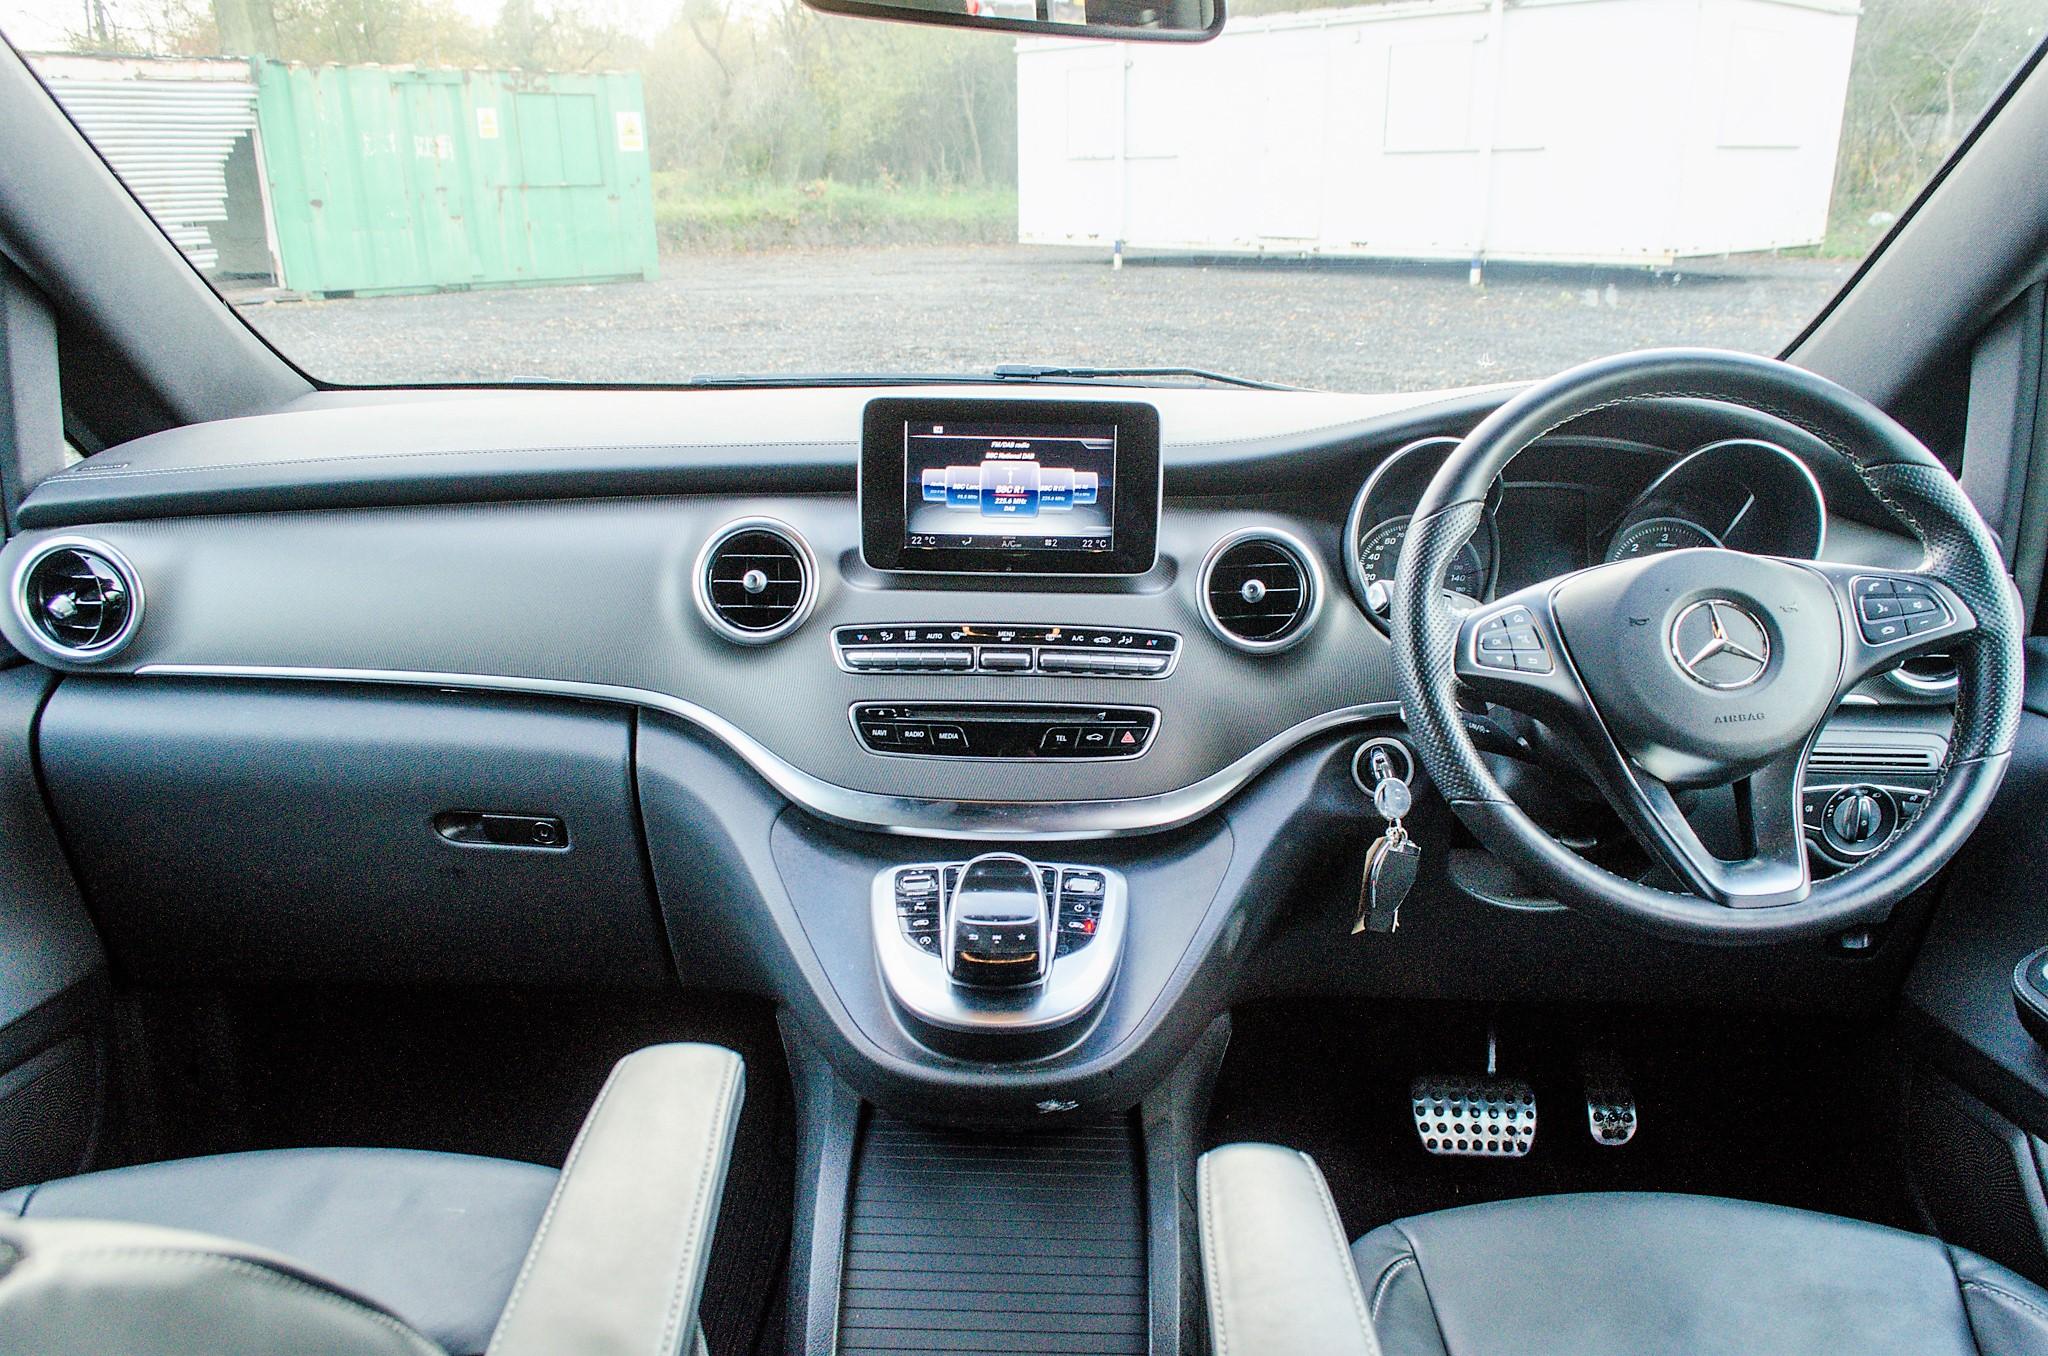 Mercedes Benz V250 Sport Bluetec XLWB auto diesel 8 seat MPV Reg No: FY68 JTO Date of First - Image 20 of 27